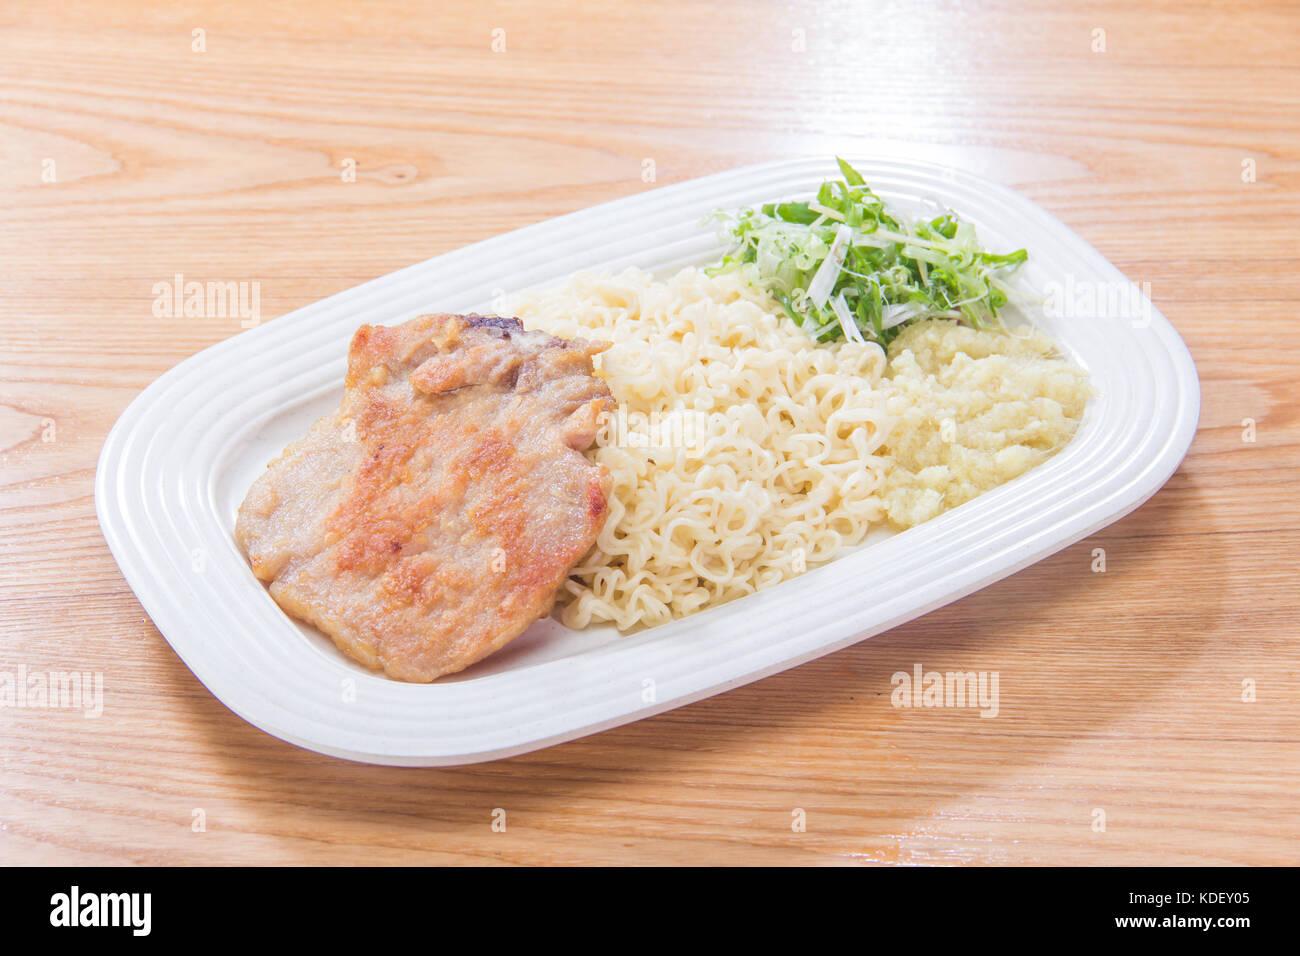 dried noodles cuisine - Stock Image